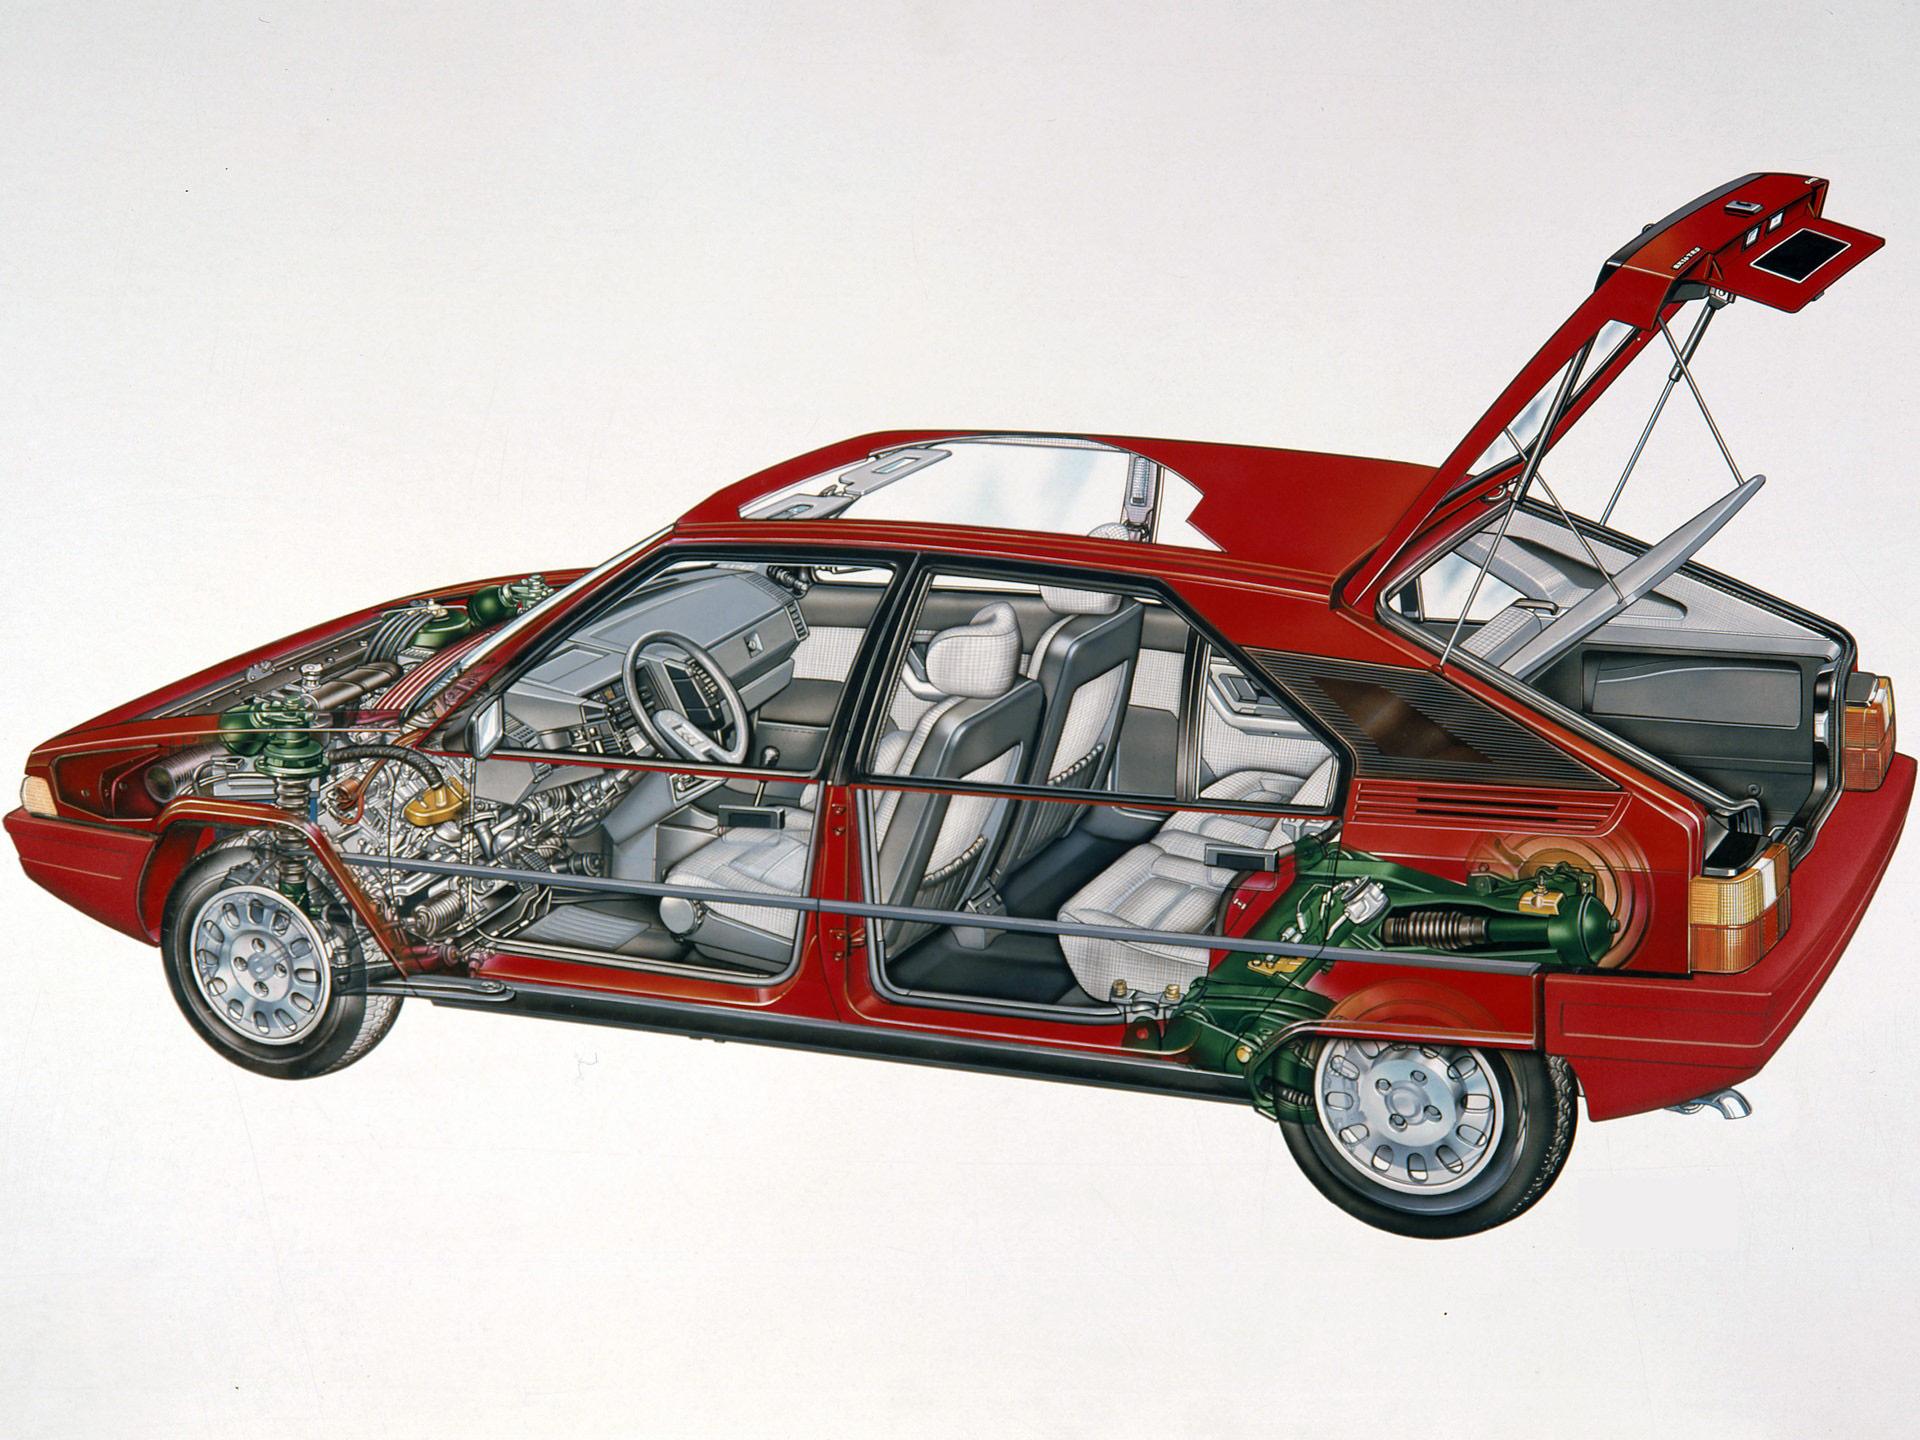 Citroen BX cutaway